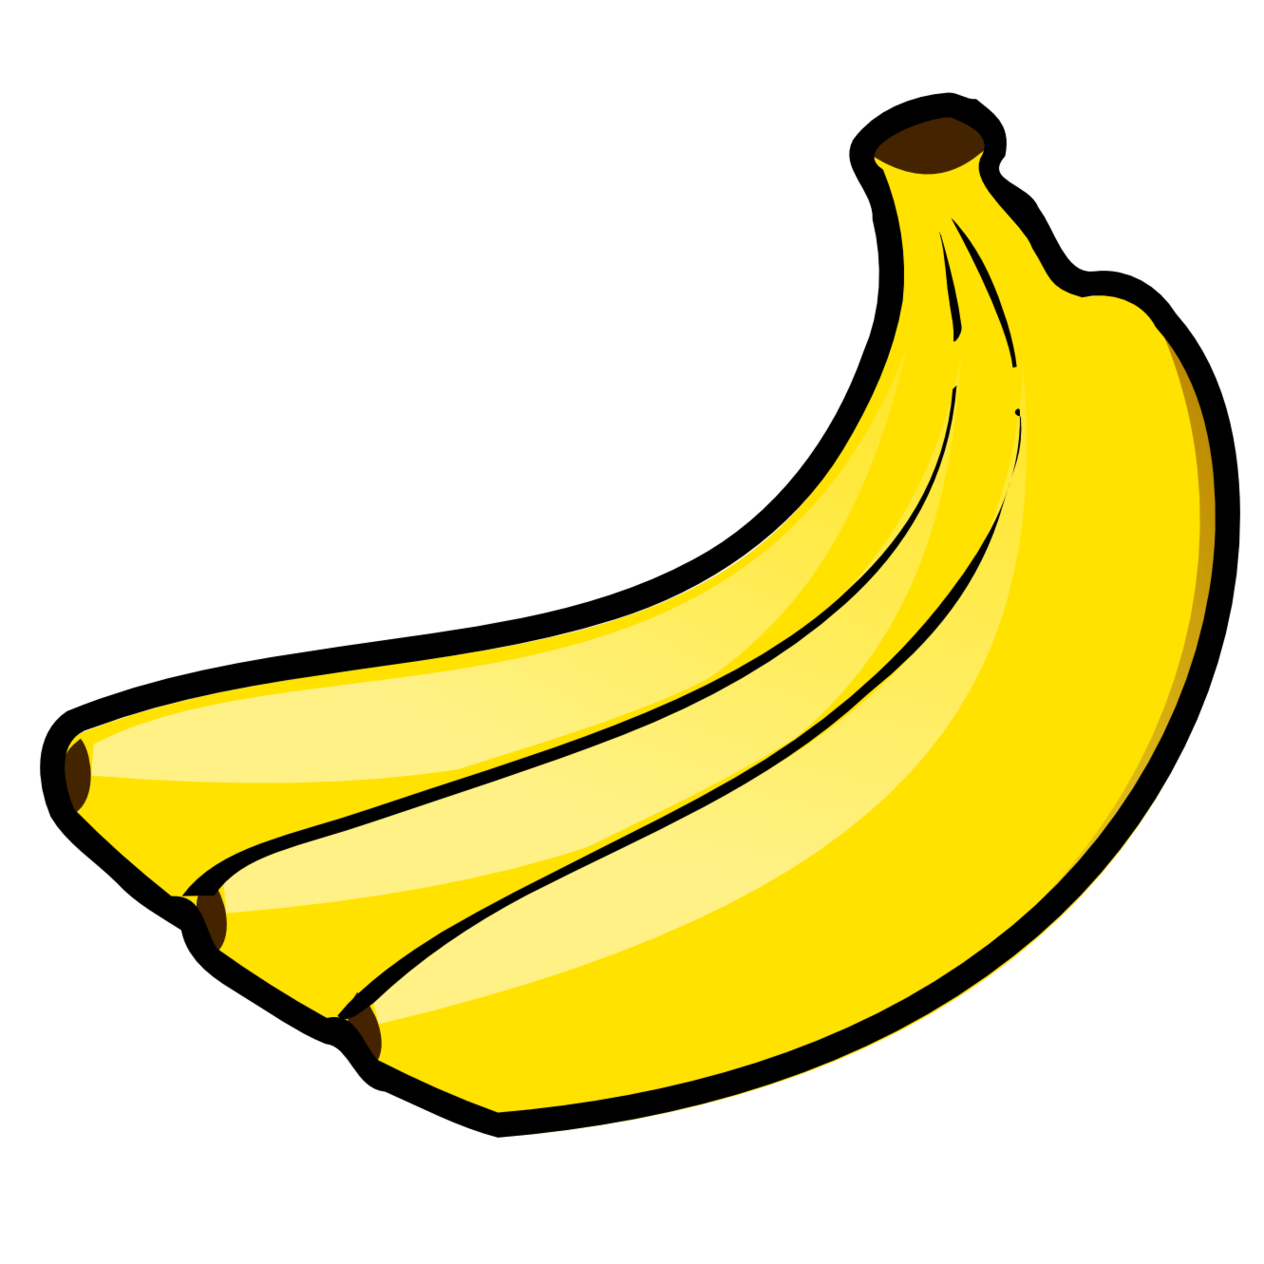 Cooking bananas clipart #12